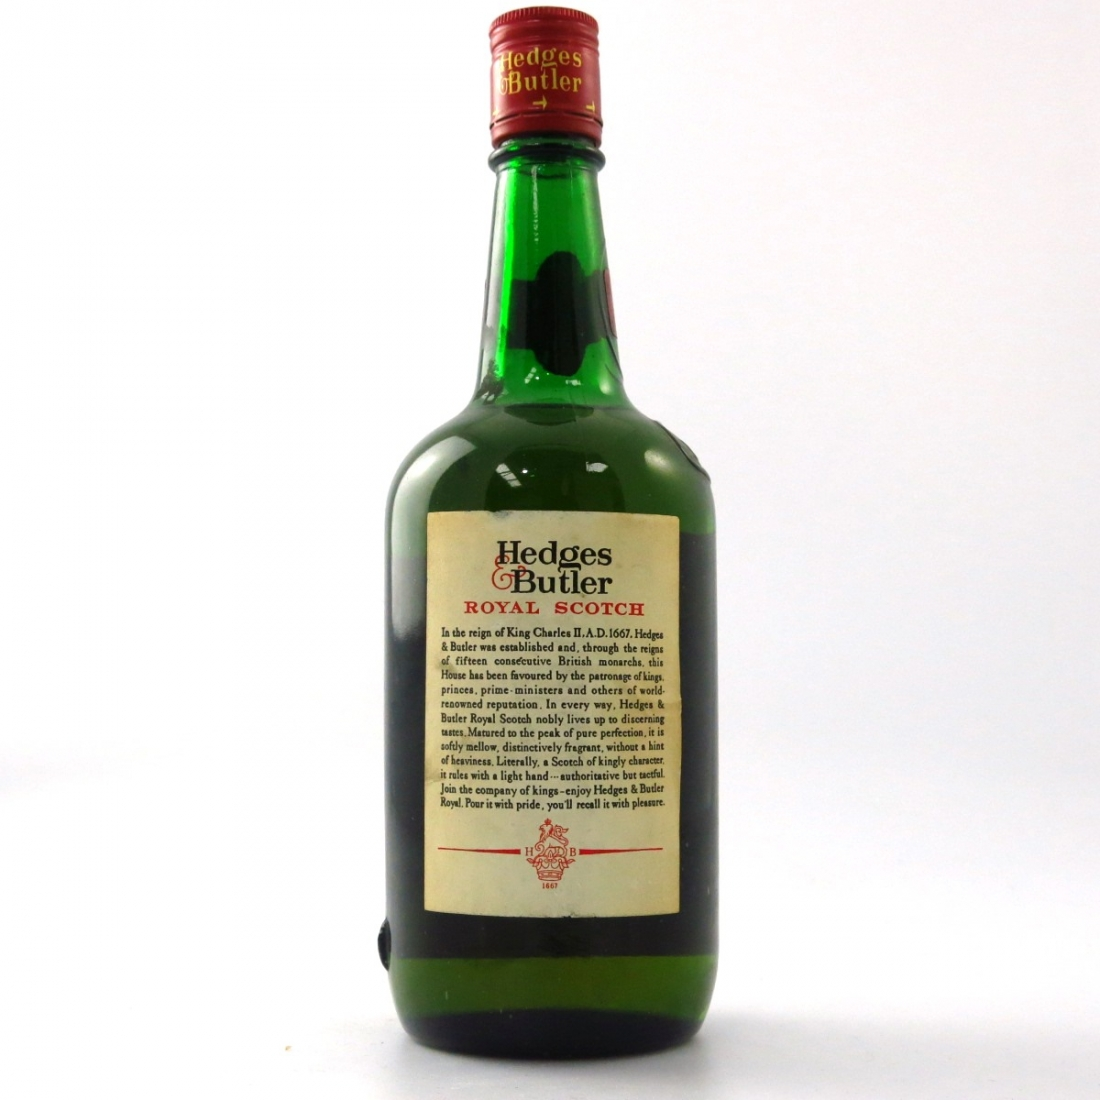 Hedges & Butler Royal De Luxe Scotch Whisky 1960s